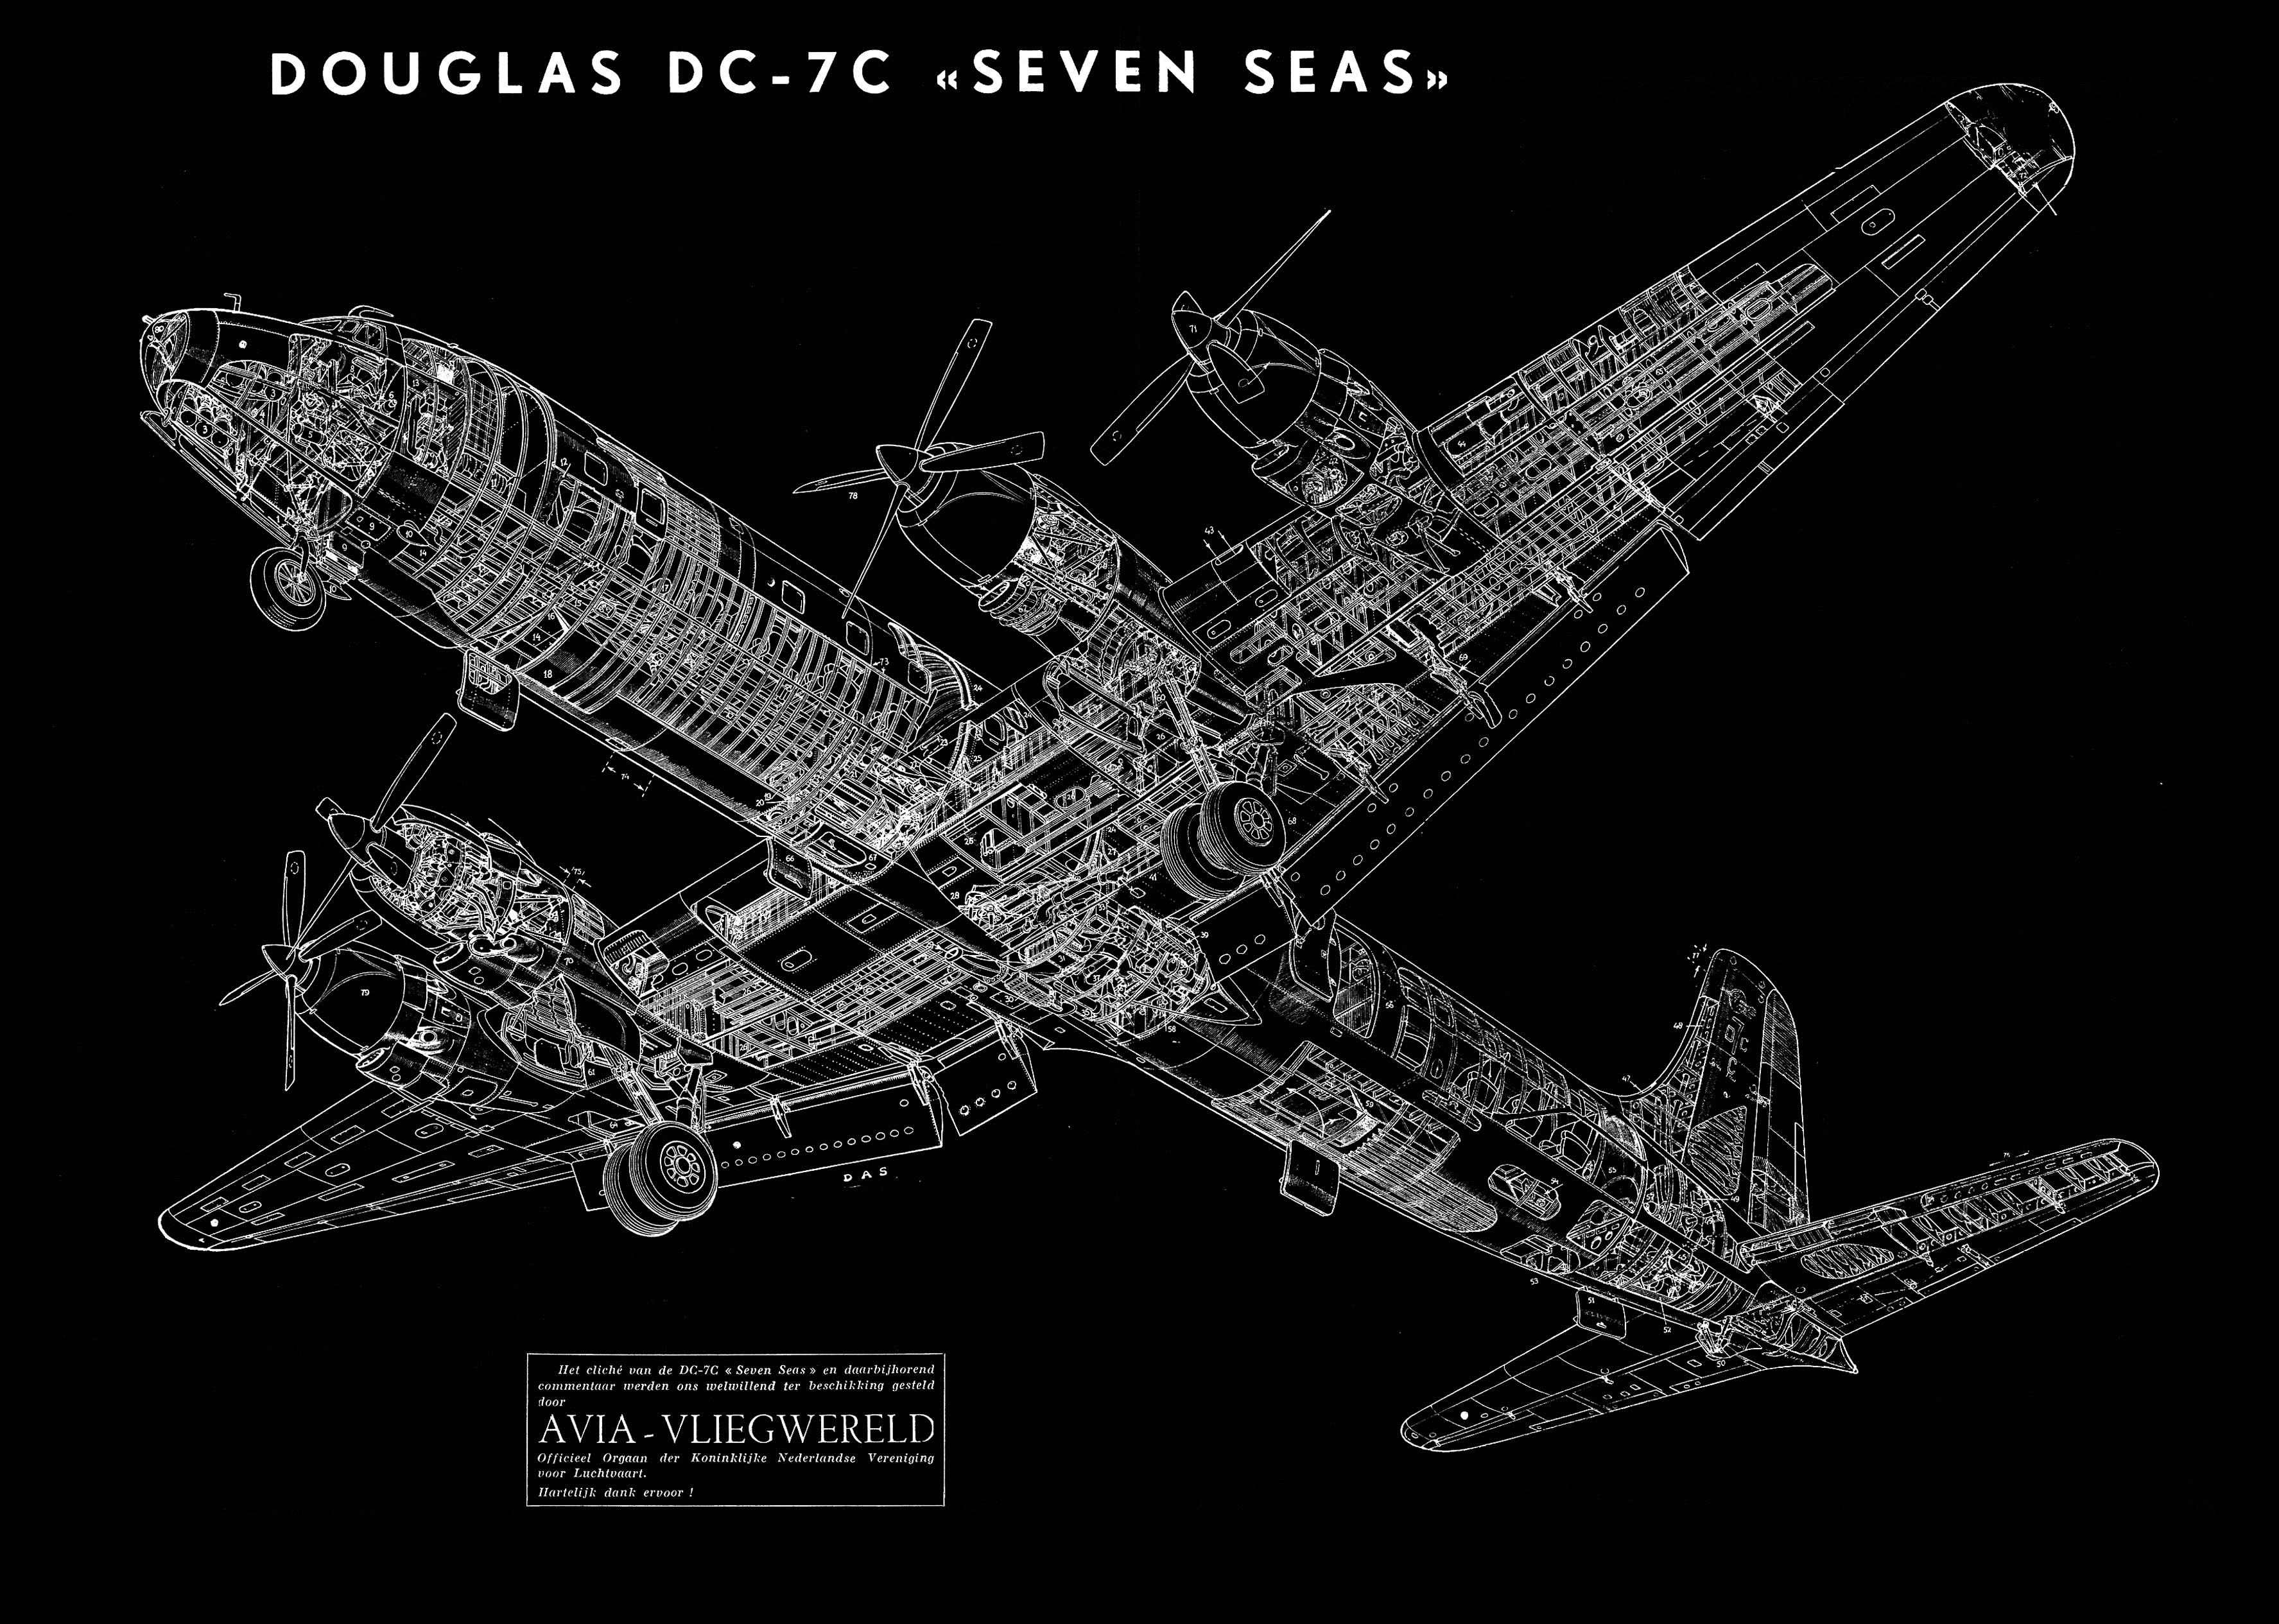 Douglas DC-7C Seven Seas HD Wallpaper | Background Image ...